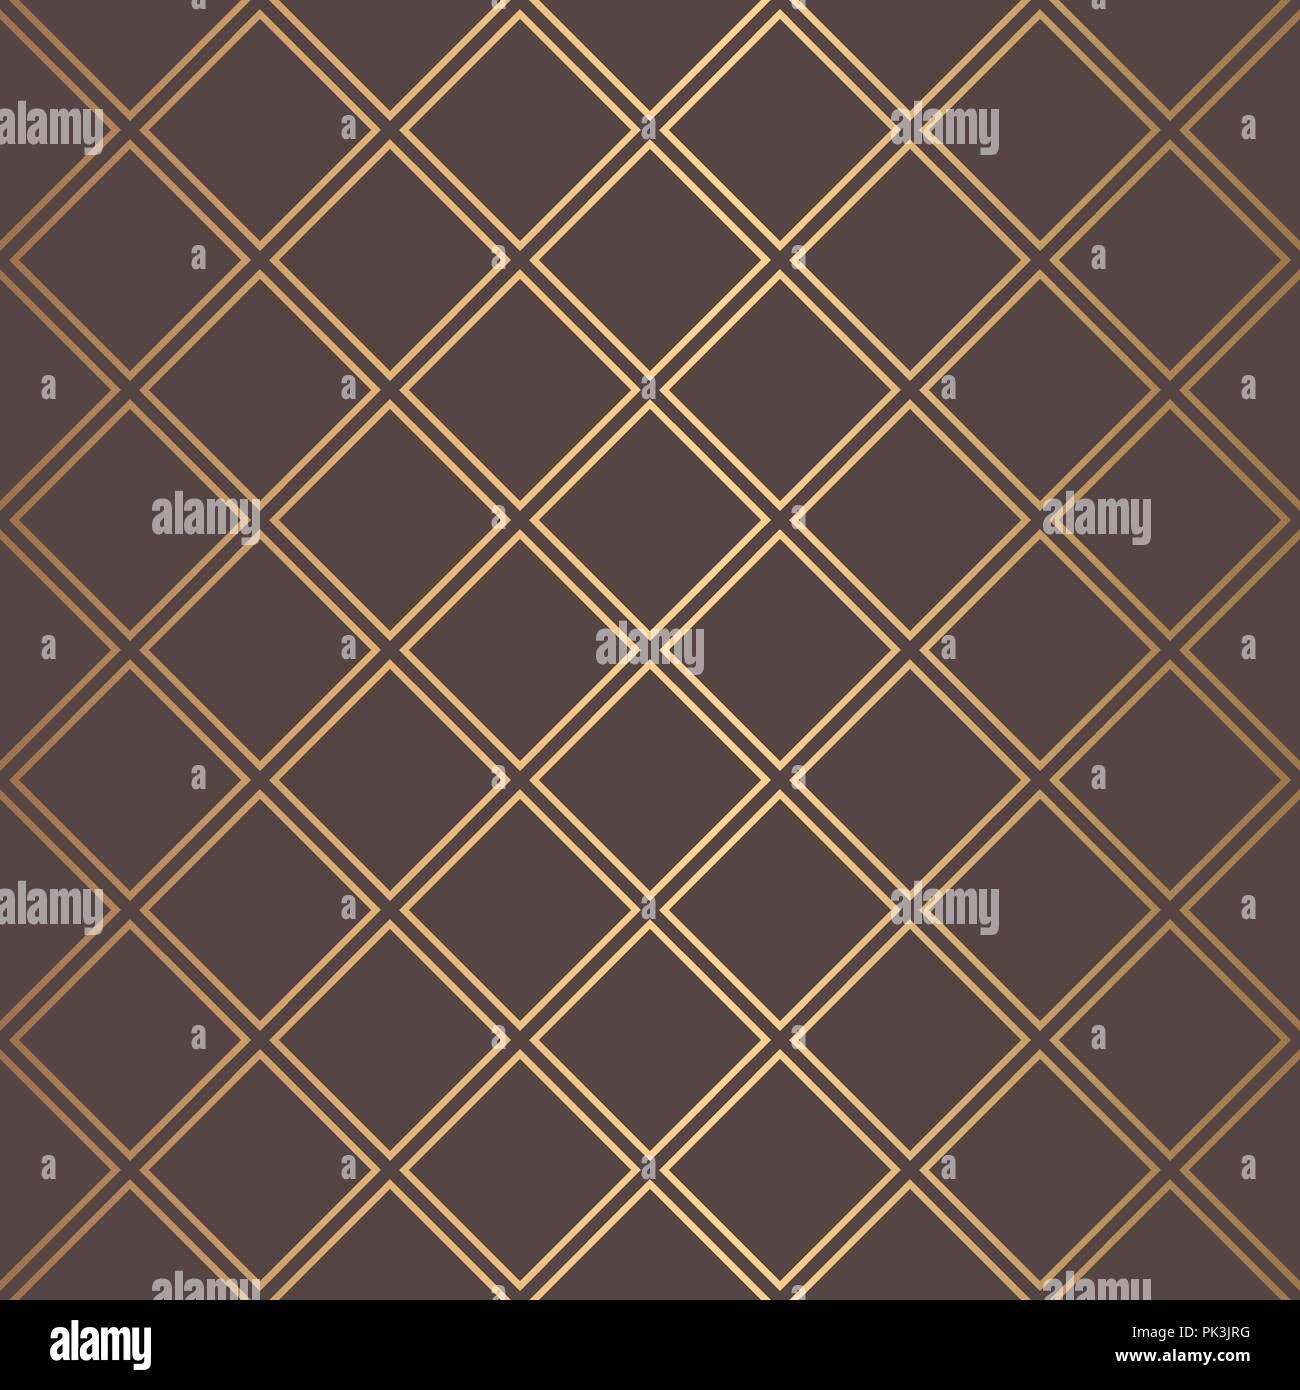 Art Deco Pattern Golden Squares Lines Background - Stock Vector